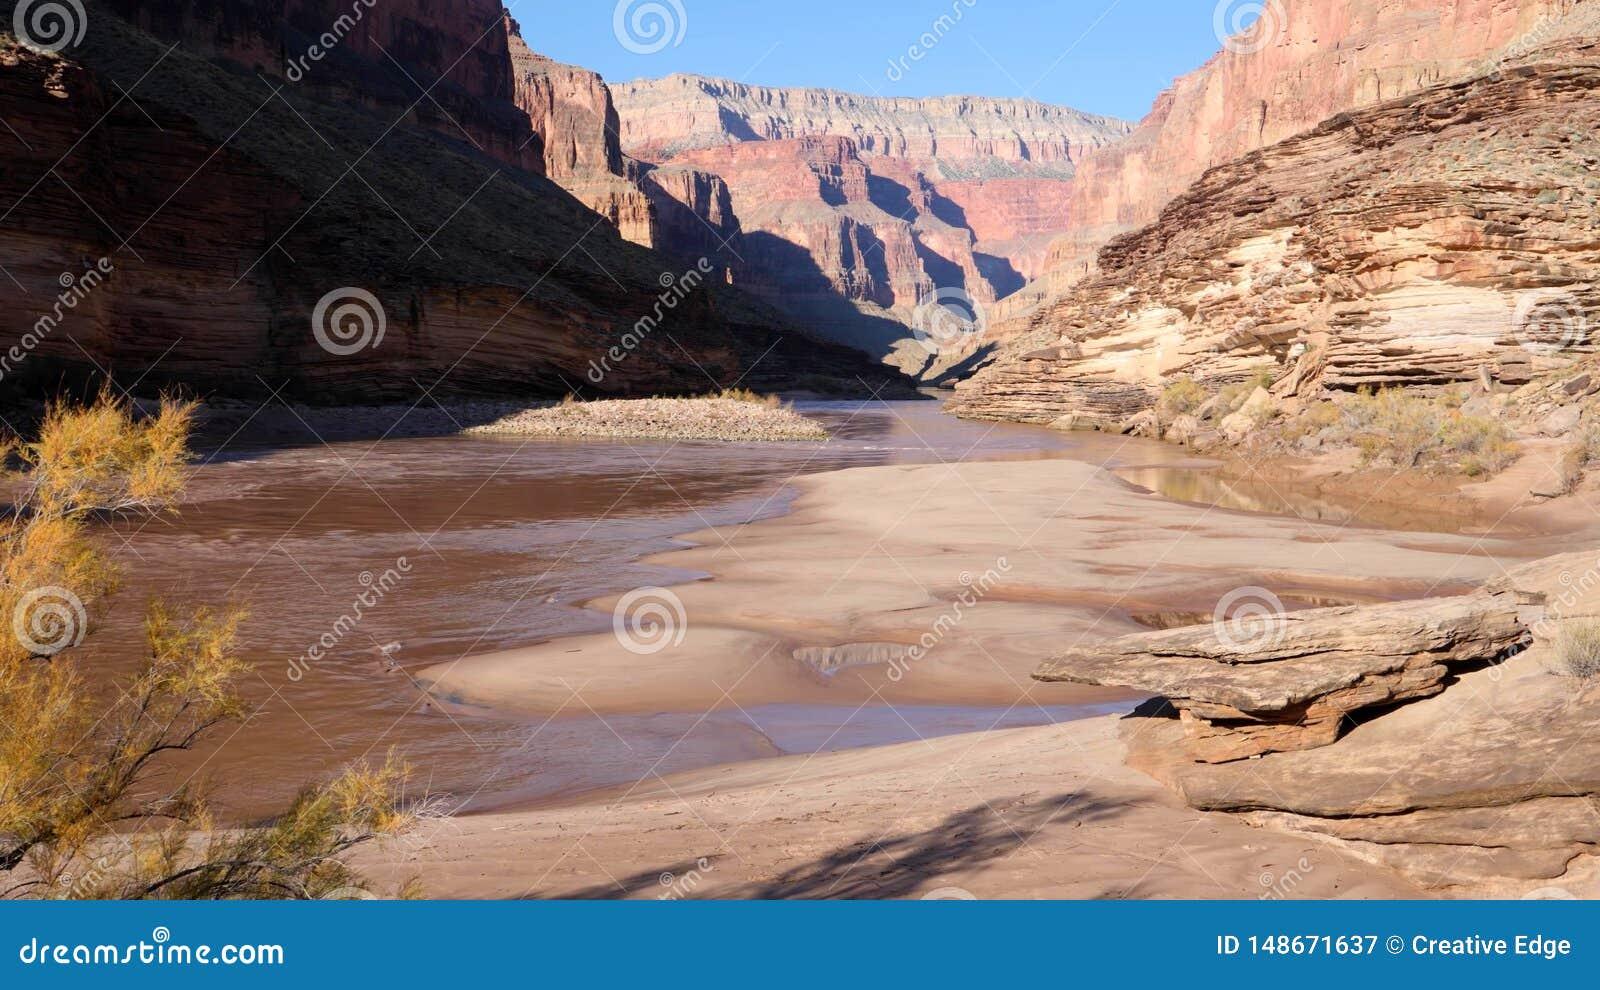 Grand Canyon, South Rim, Arizona, United States of America